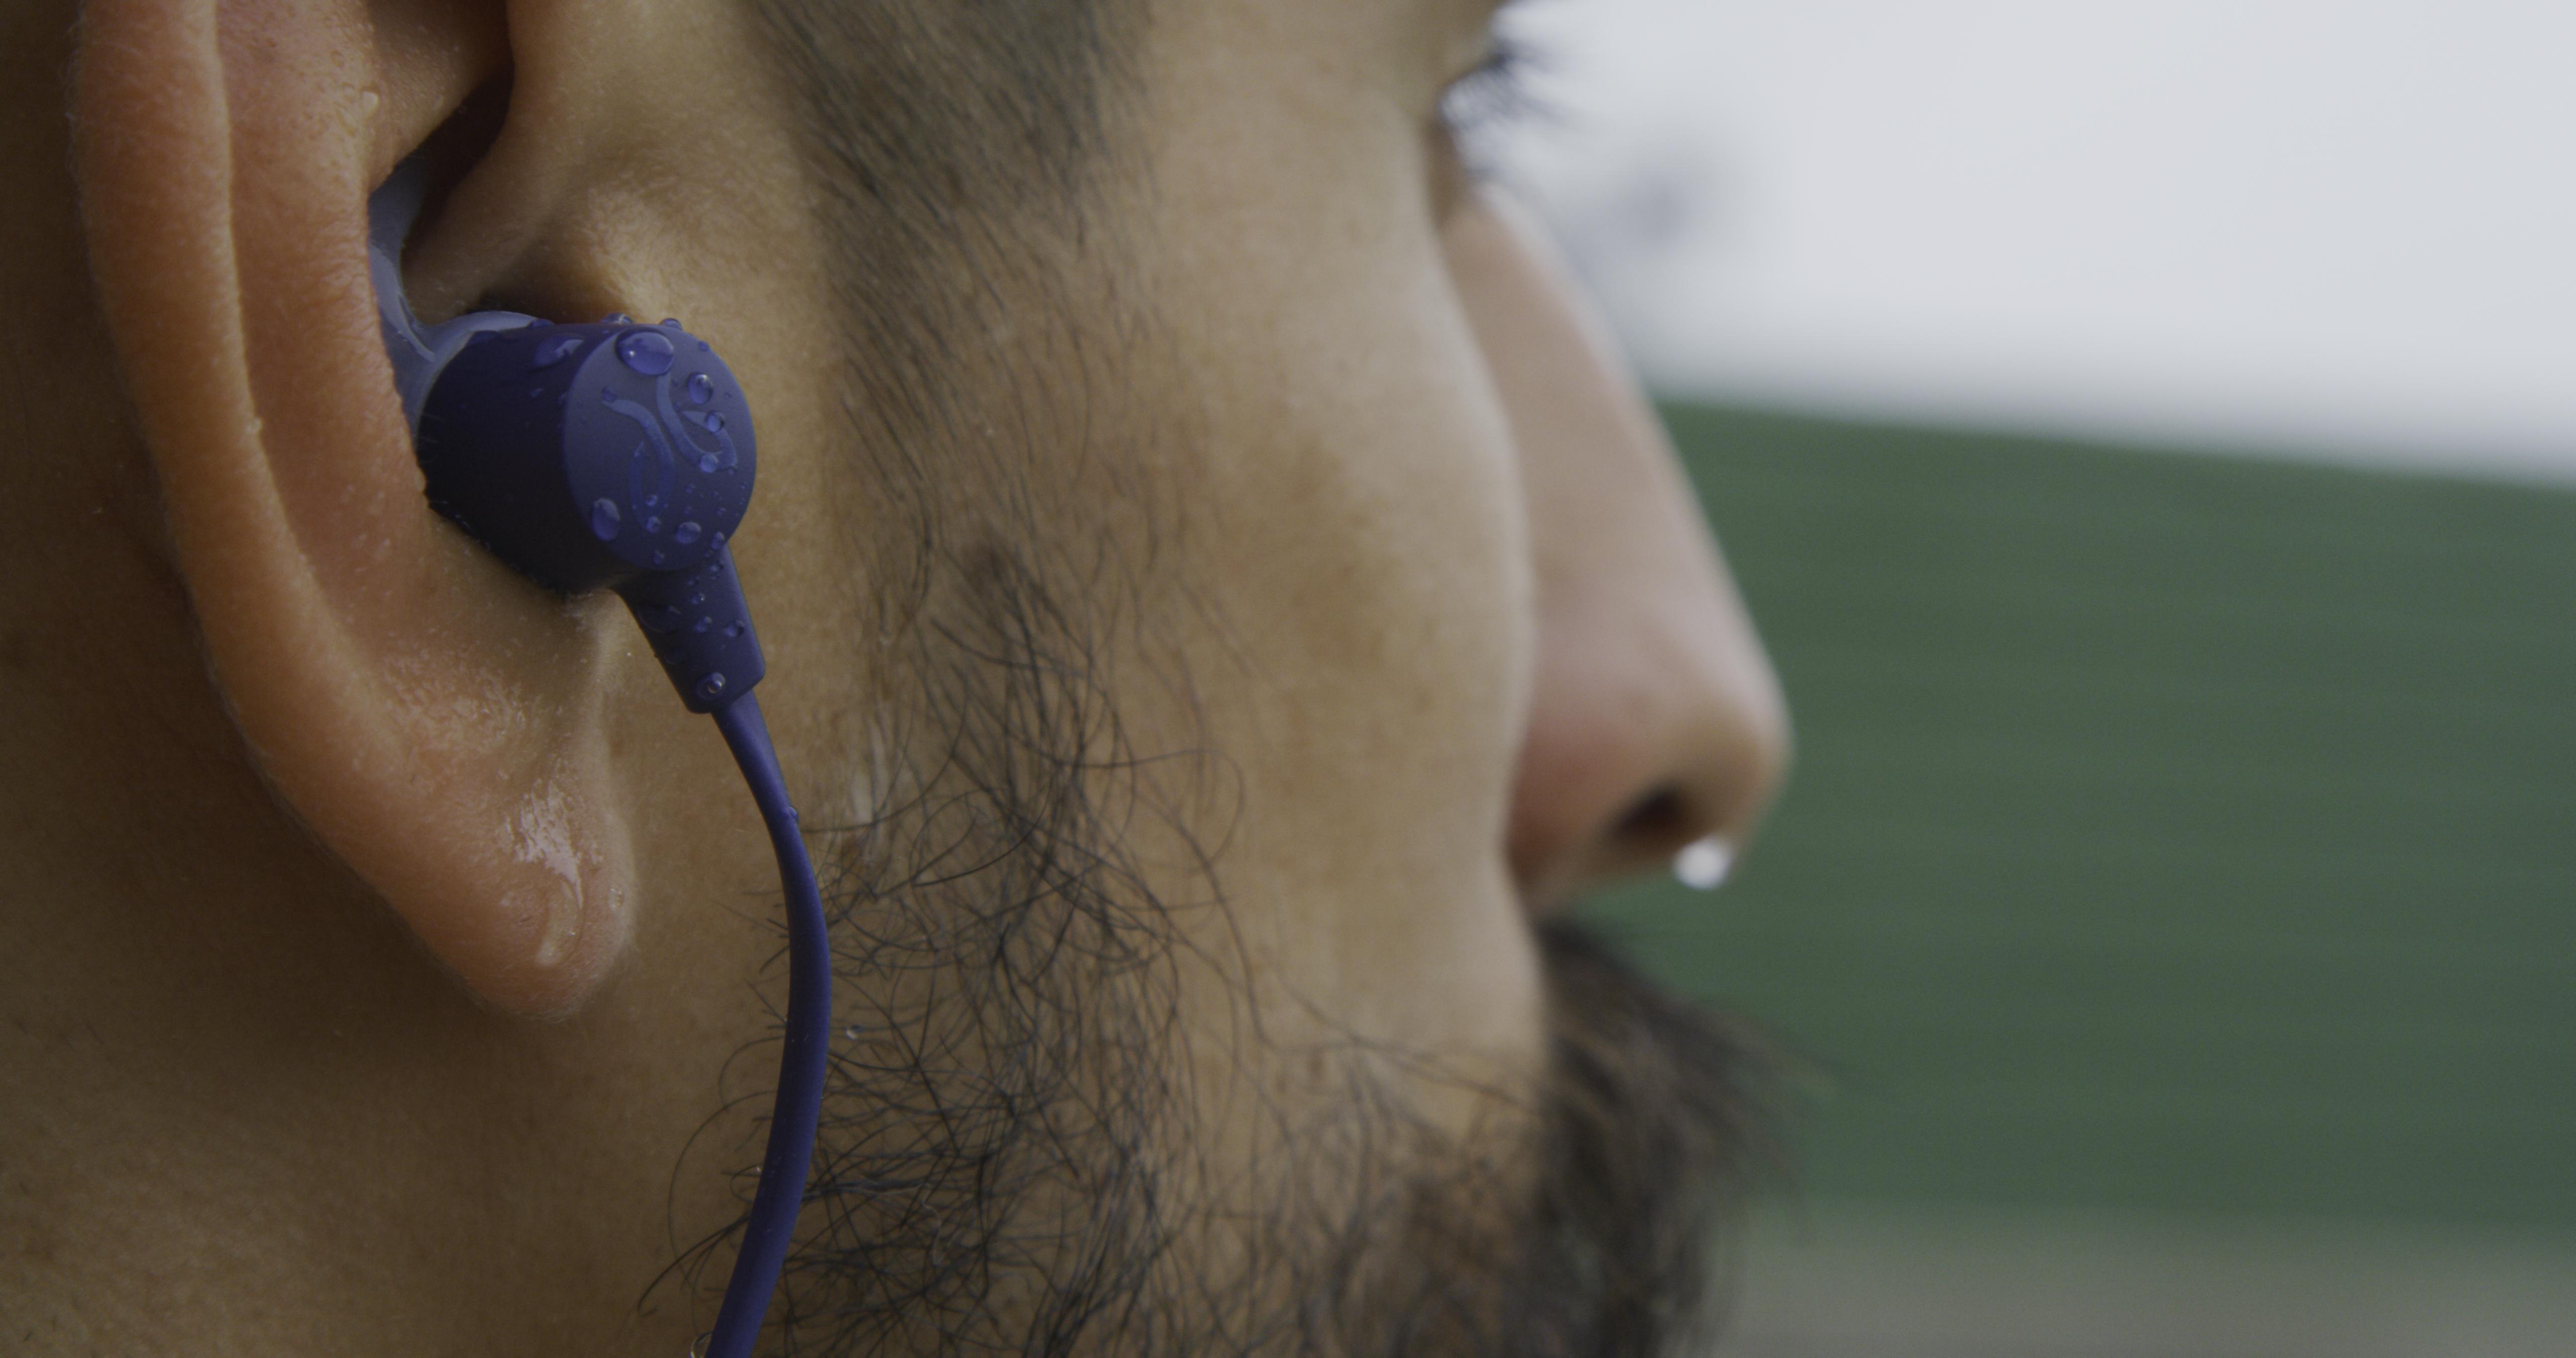 Jaybird Tarah Wireless, gli auricolari pensati appositamente per lo sport thumbnail